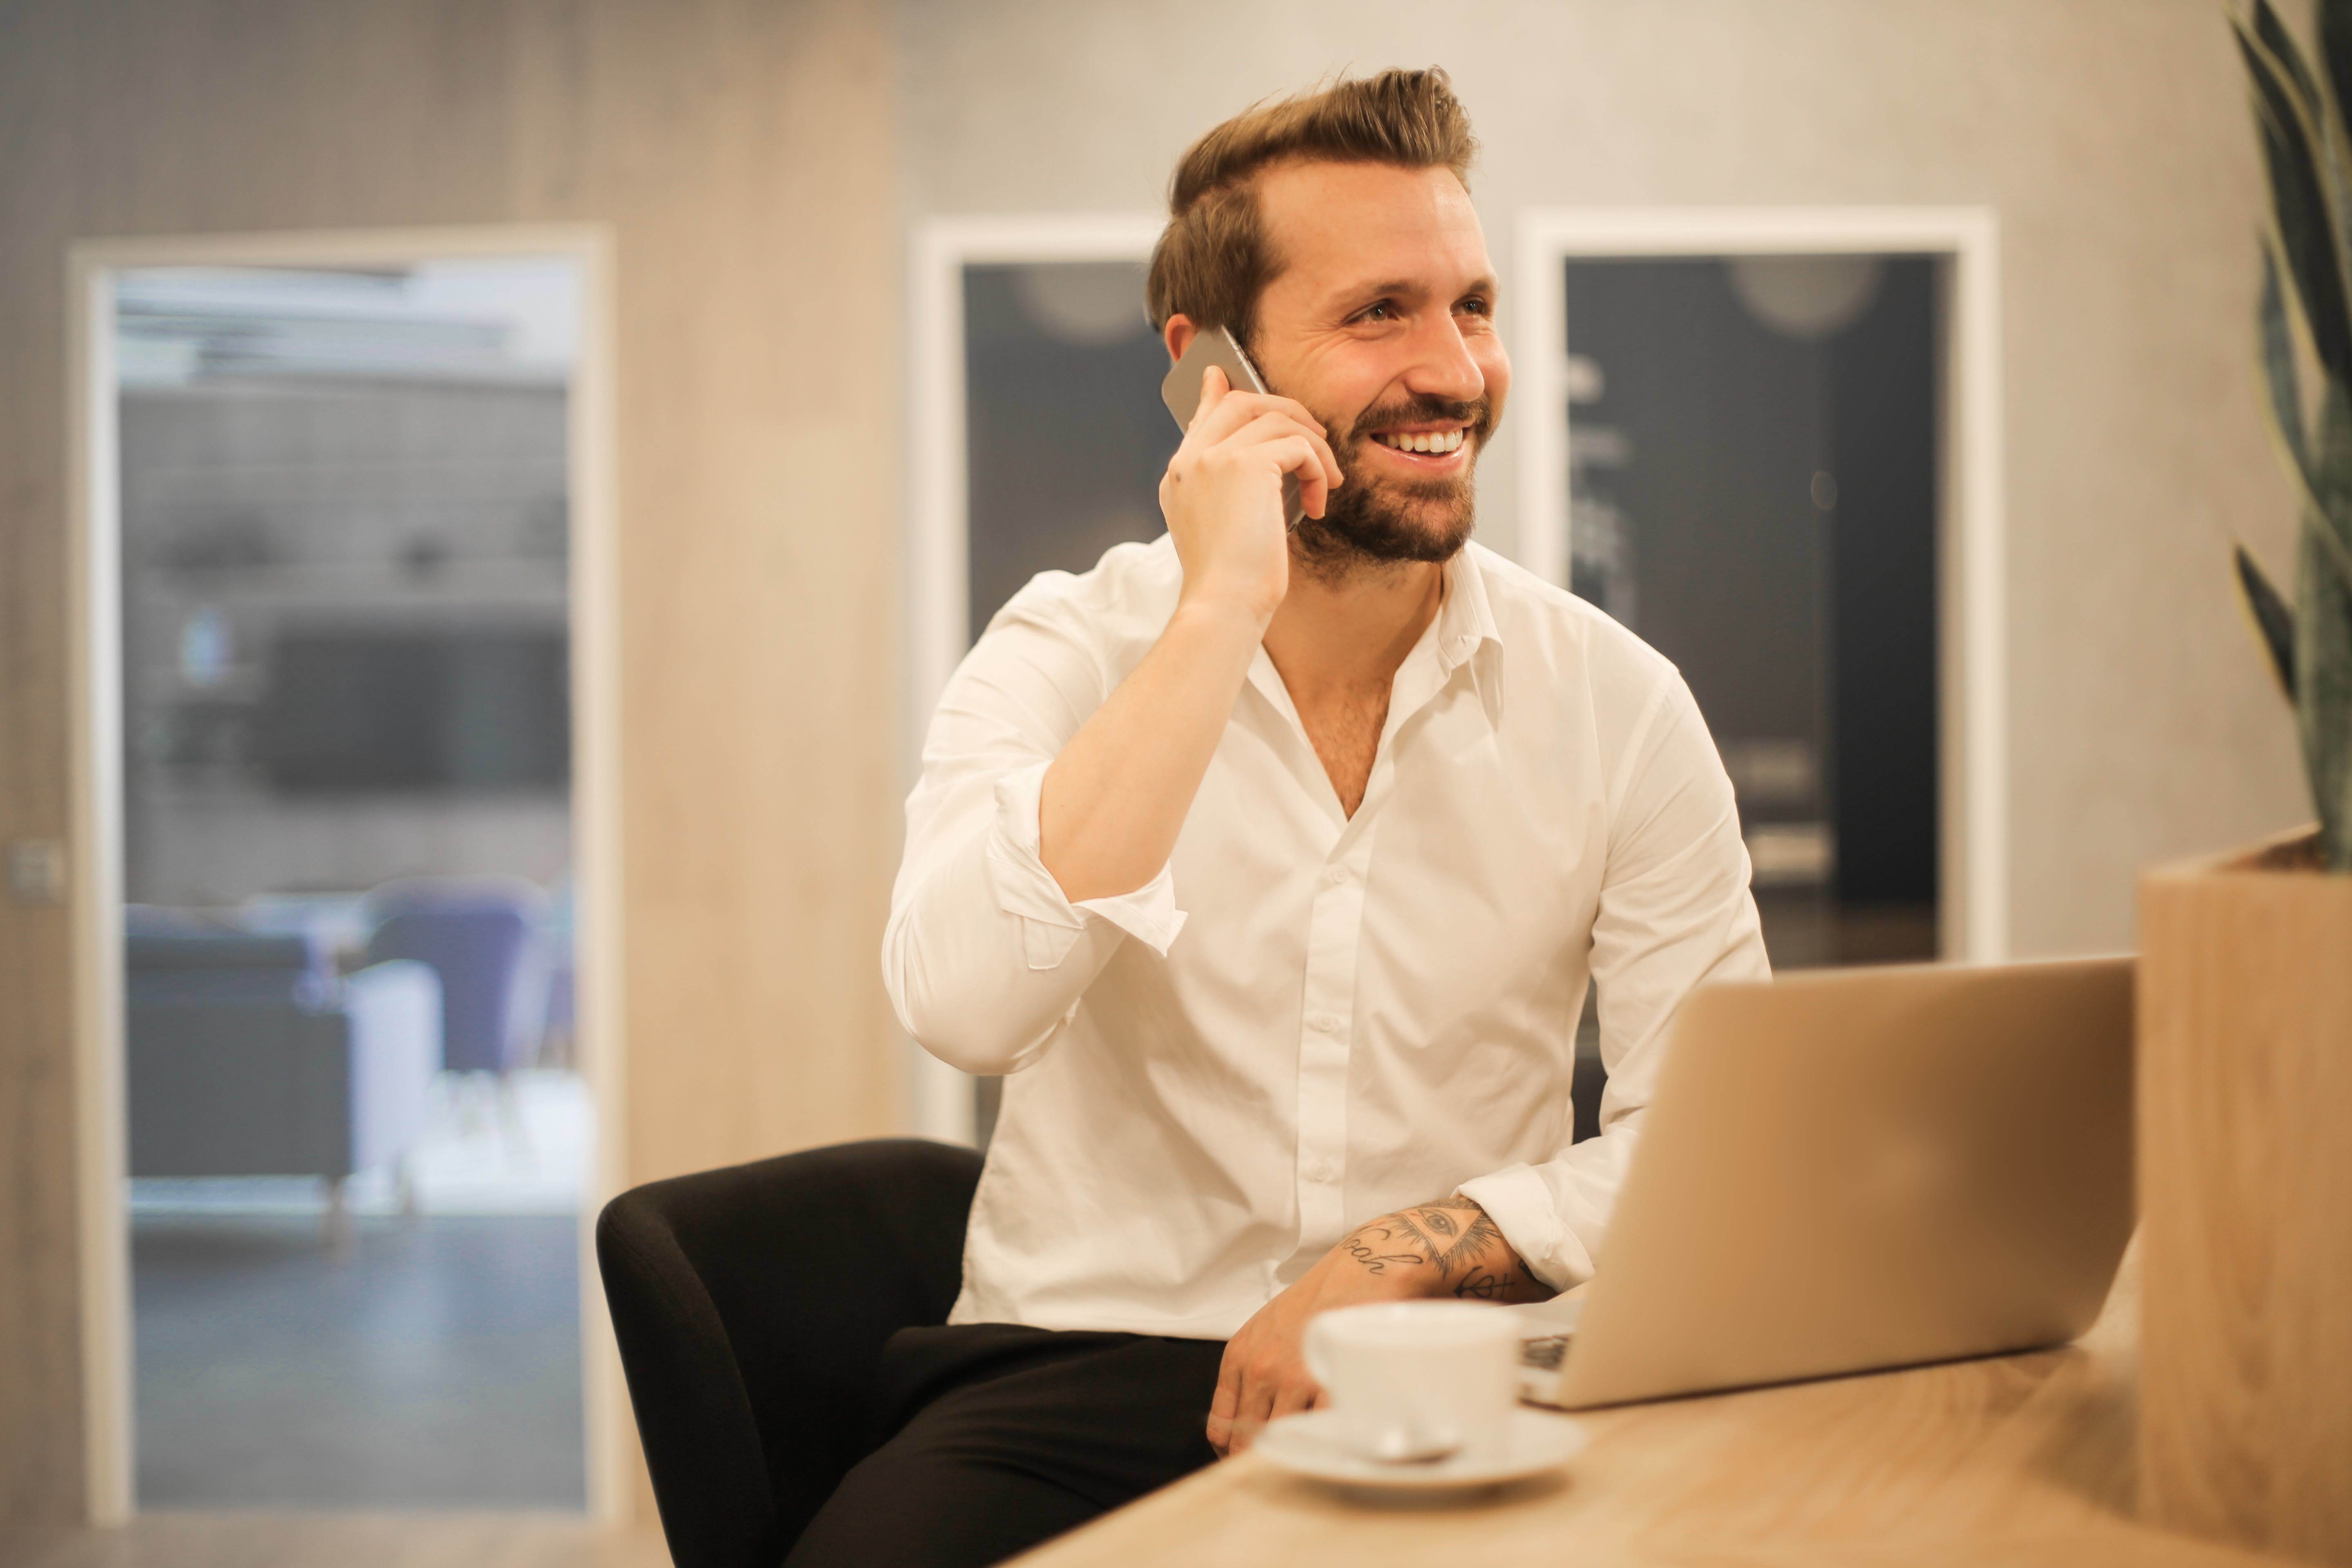 creating customer experiences